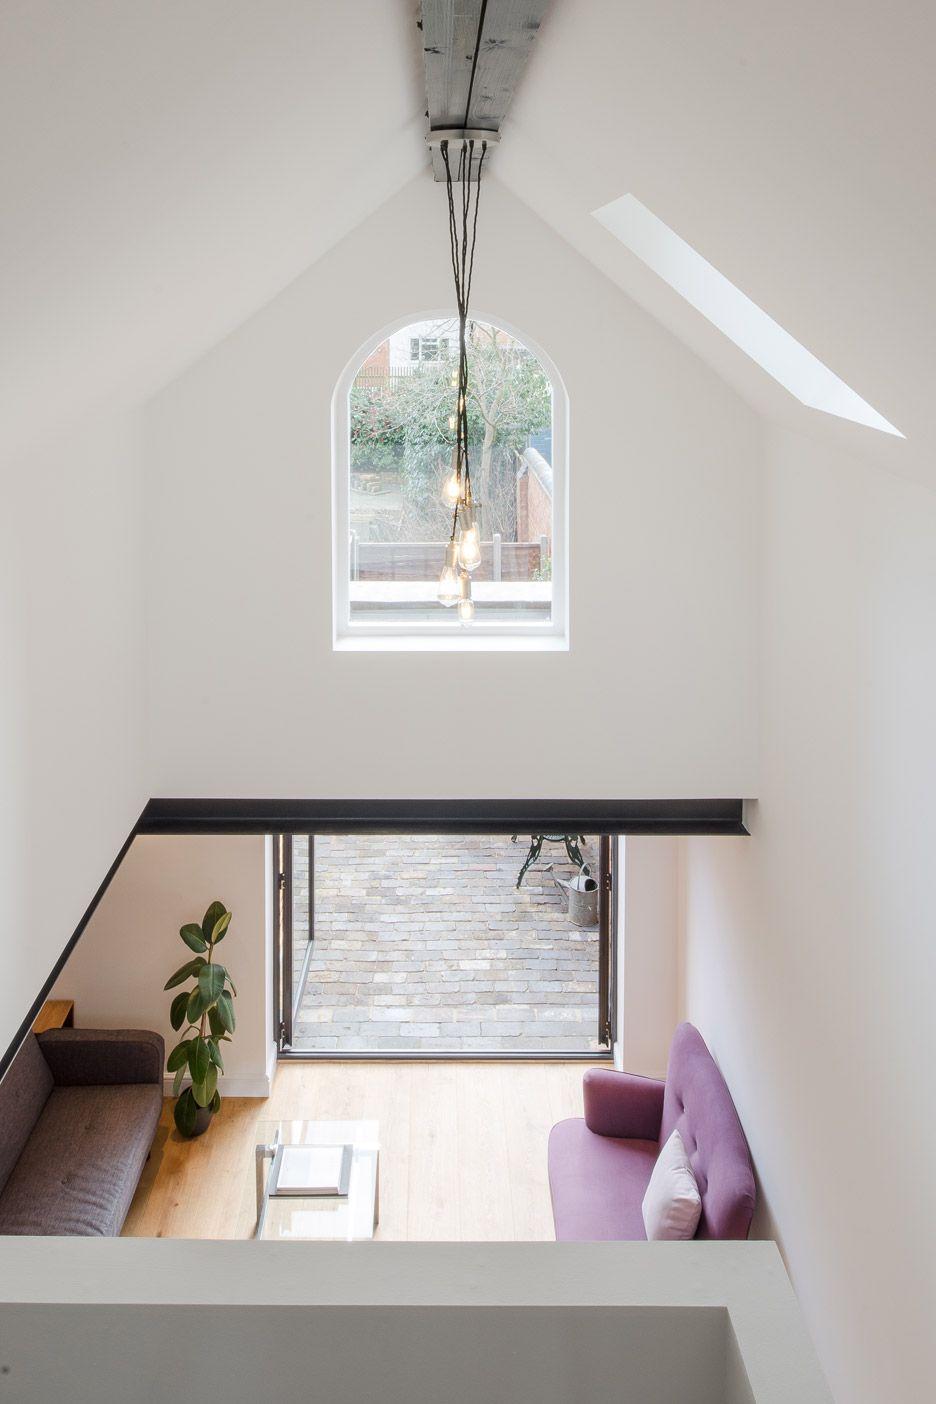 writers-coach-house-intervention-architecture-studio-renovation-moseley-birmingham-england_dezeen_936_7